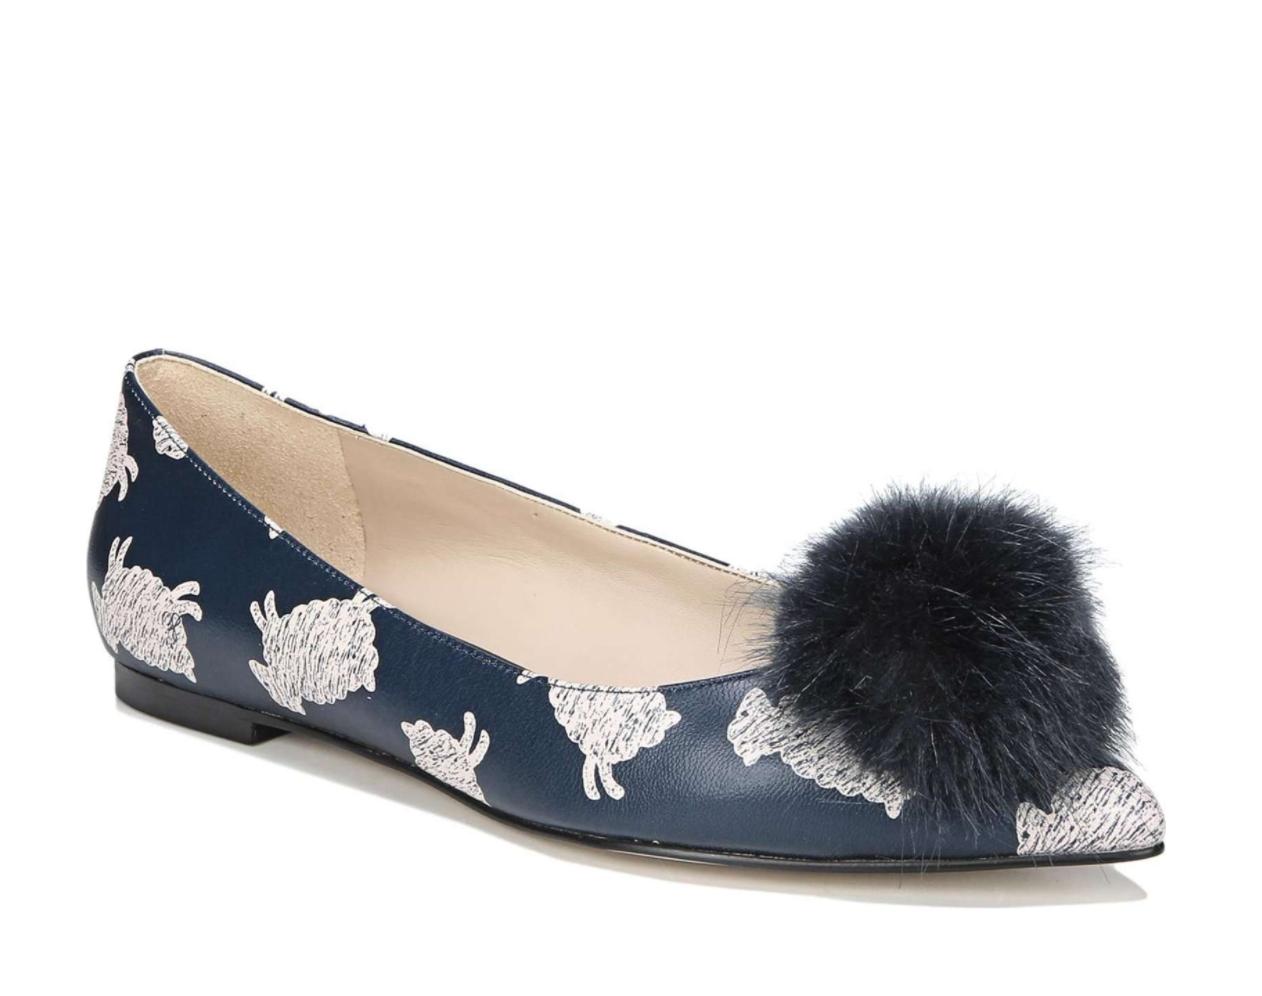 The season of stylish flats is here! Fall shoe love: Sam Edelman Raddie Faux Fur Pompom Flat | glitterinc.com | @glitterinc